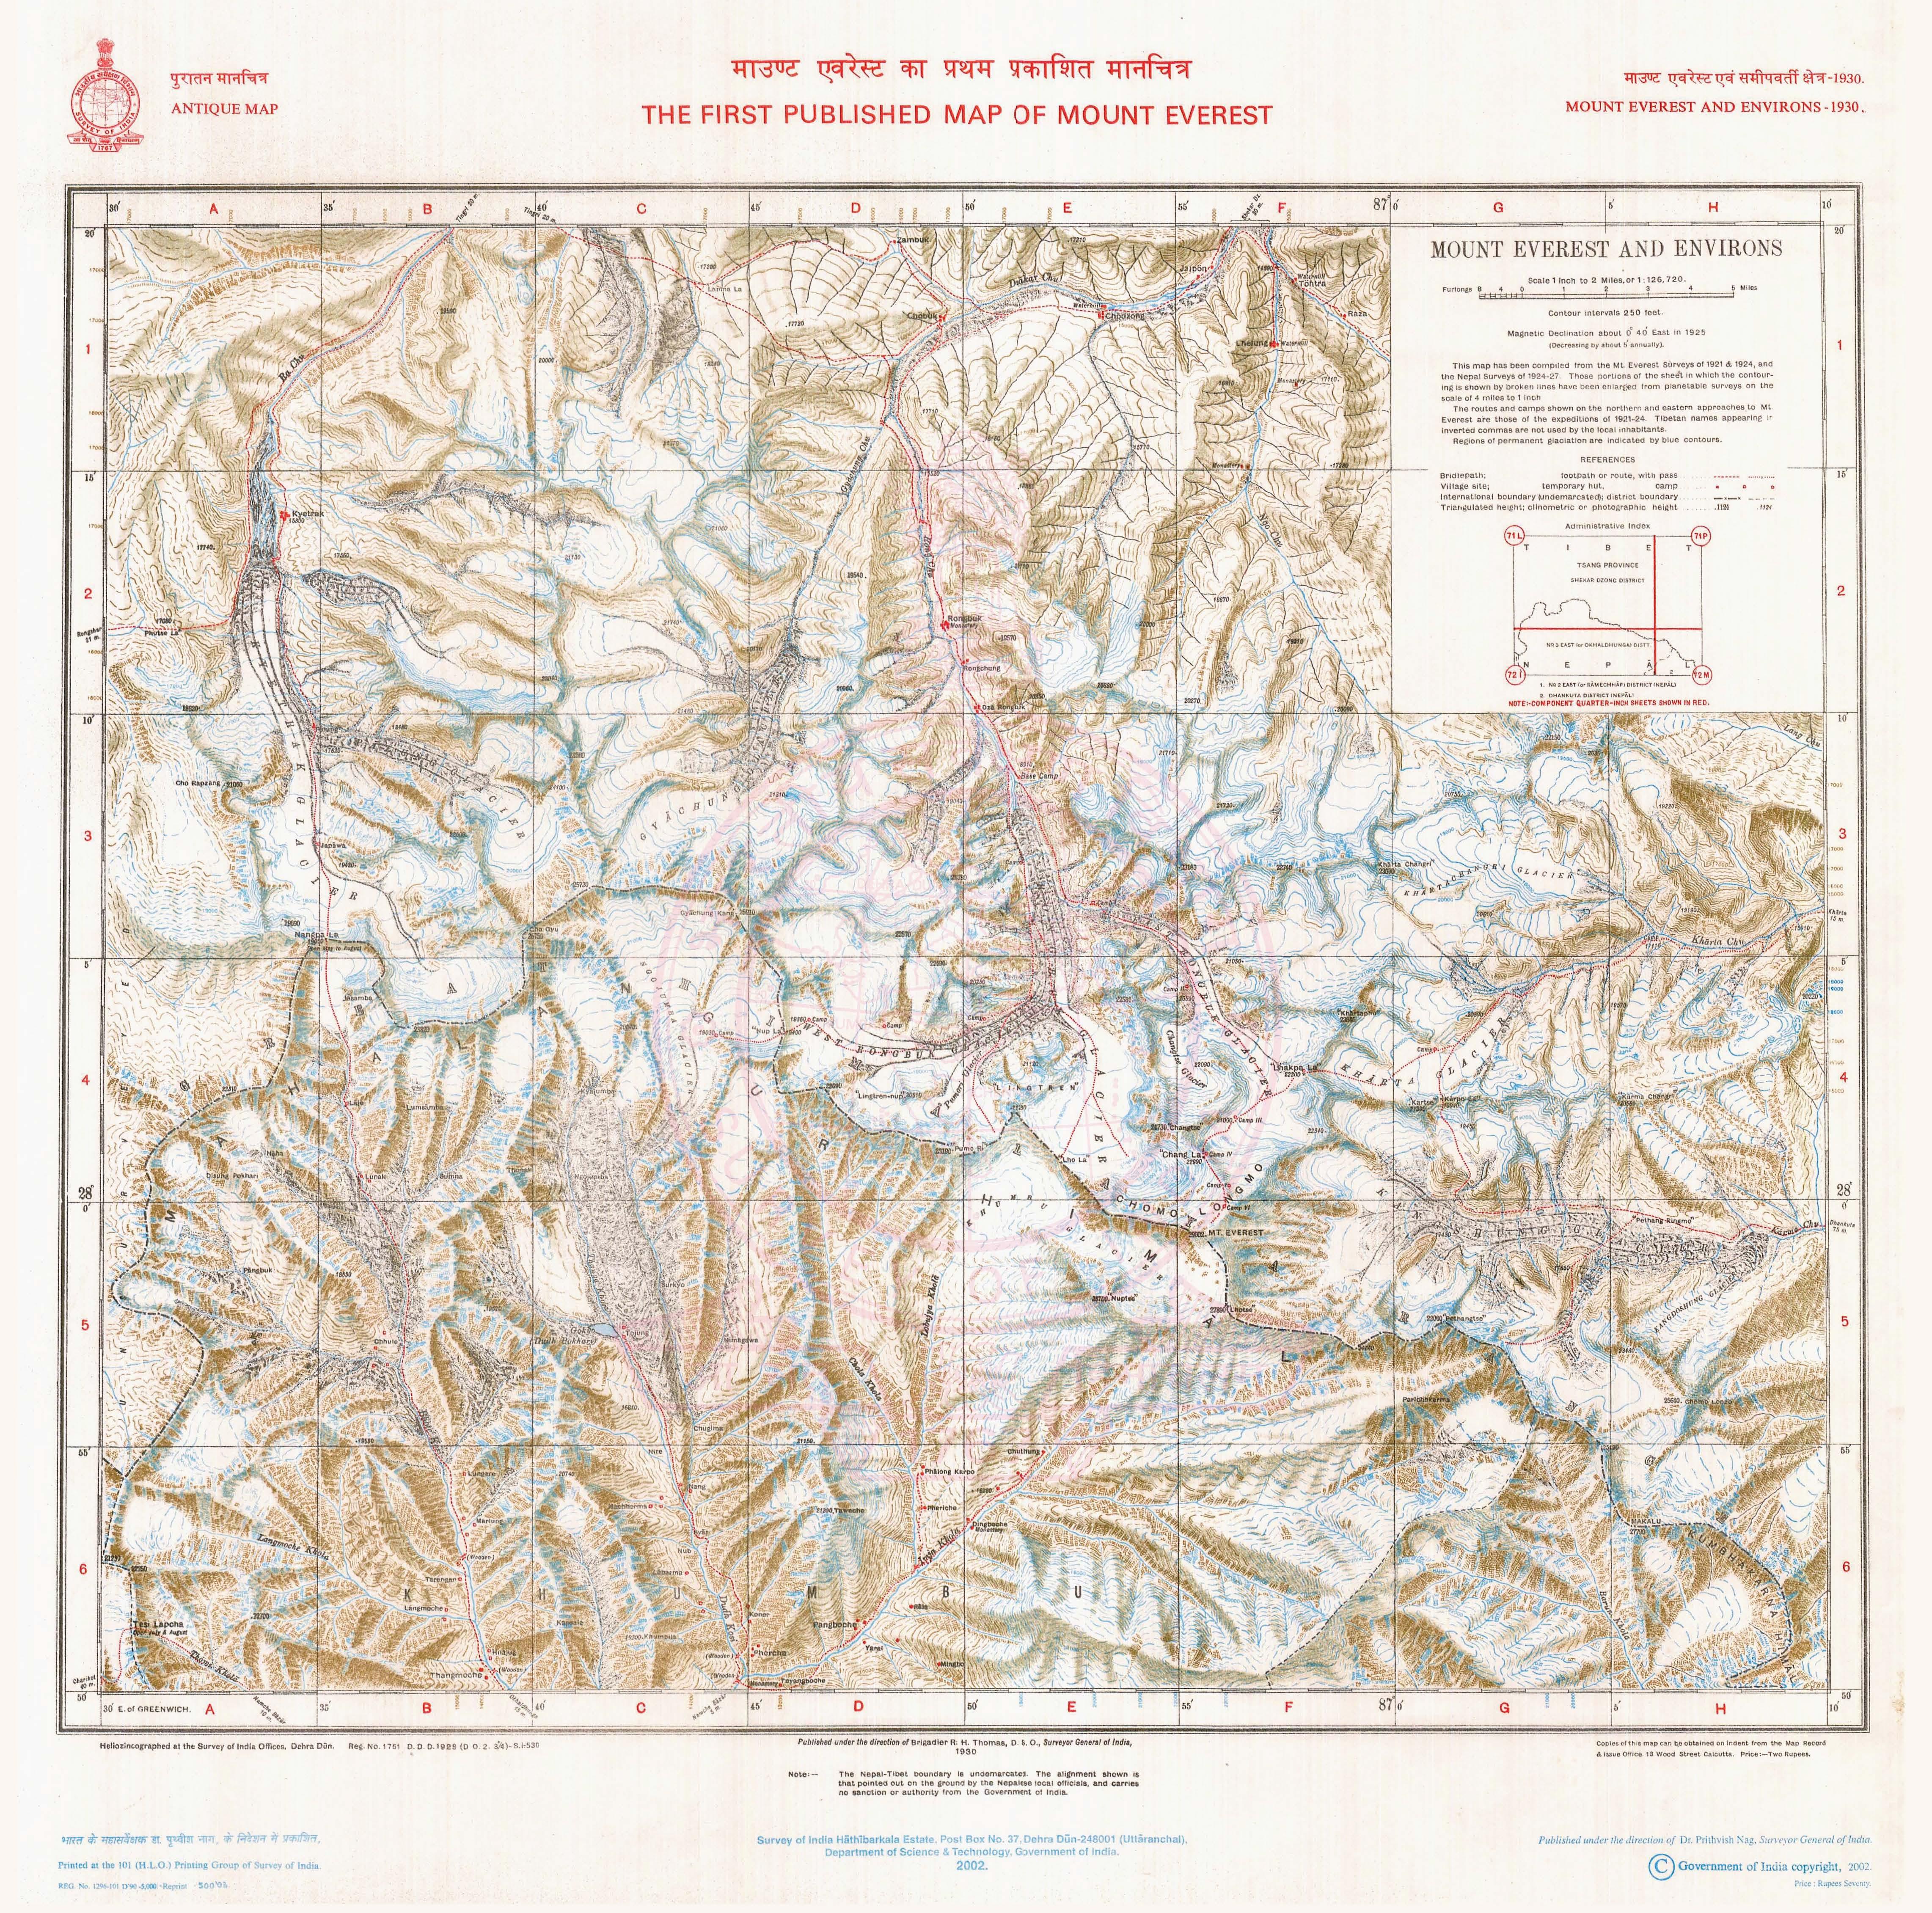 Antique Maps Survey Of India - Buy ancient maps